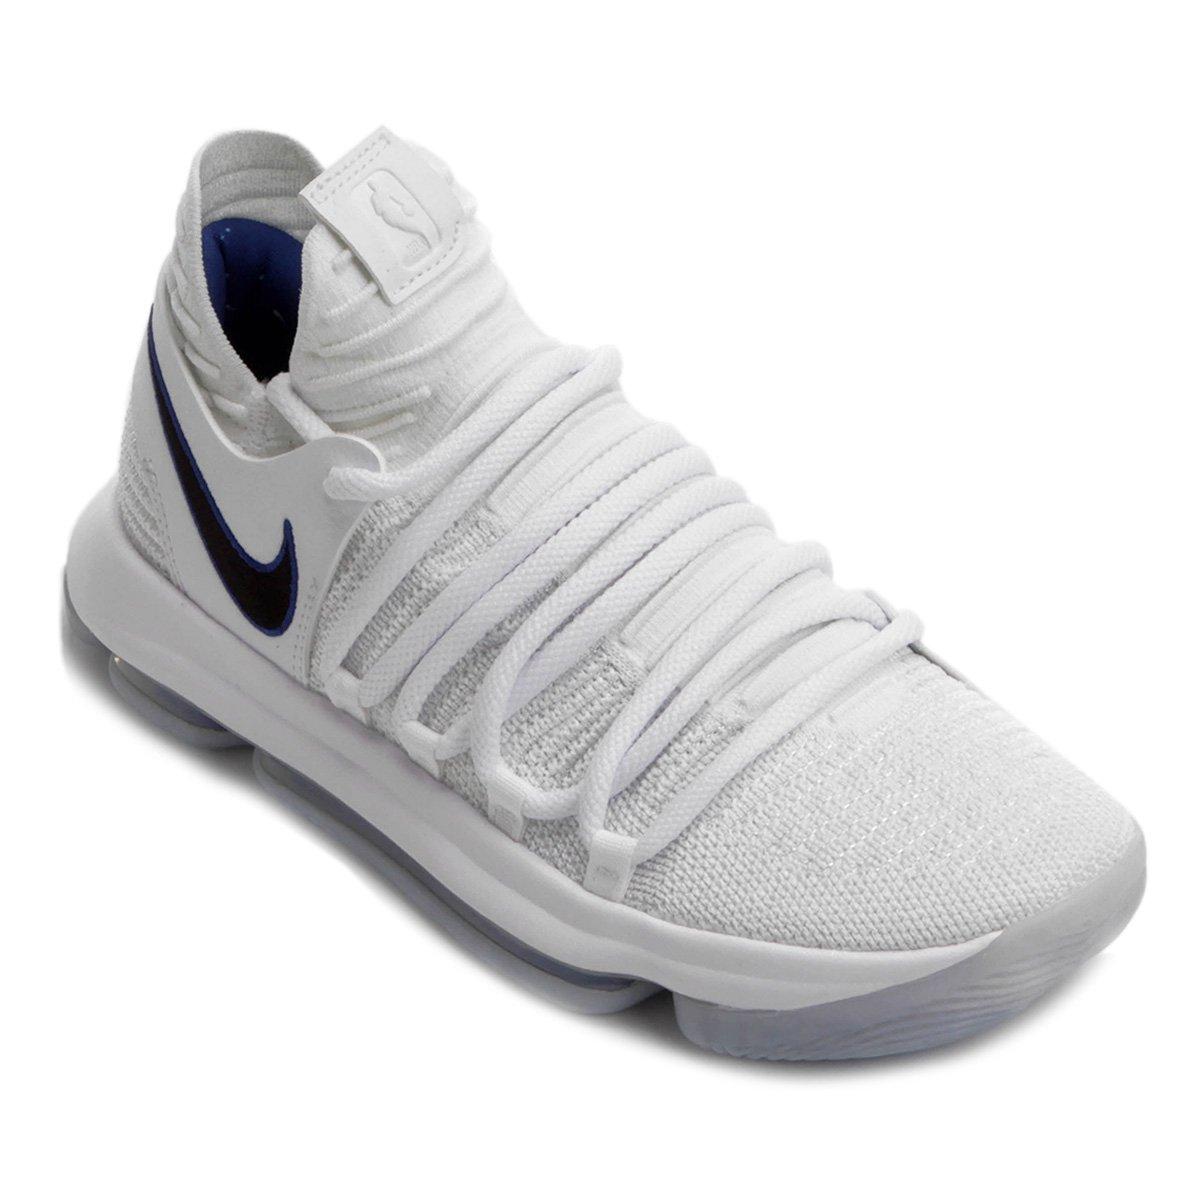 Tênis Nike Zoom KD 10 Masculino - Compre Agora  9c61907aae7fa